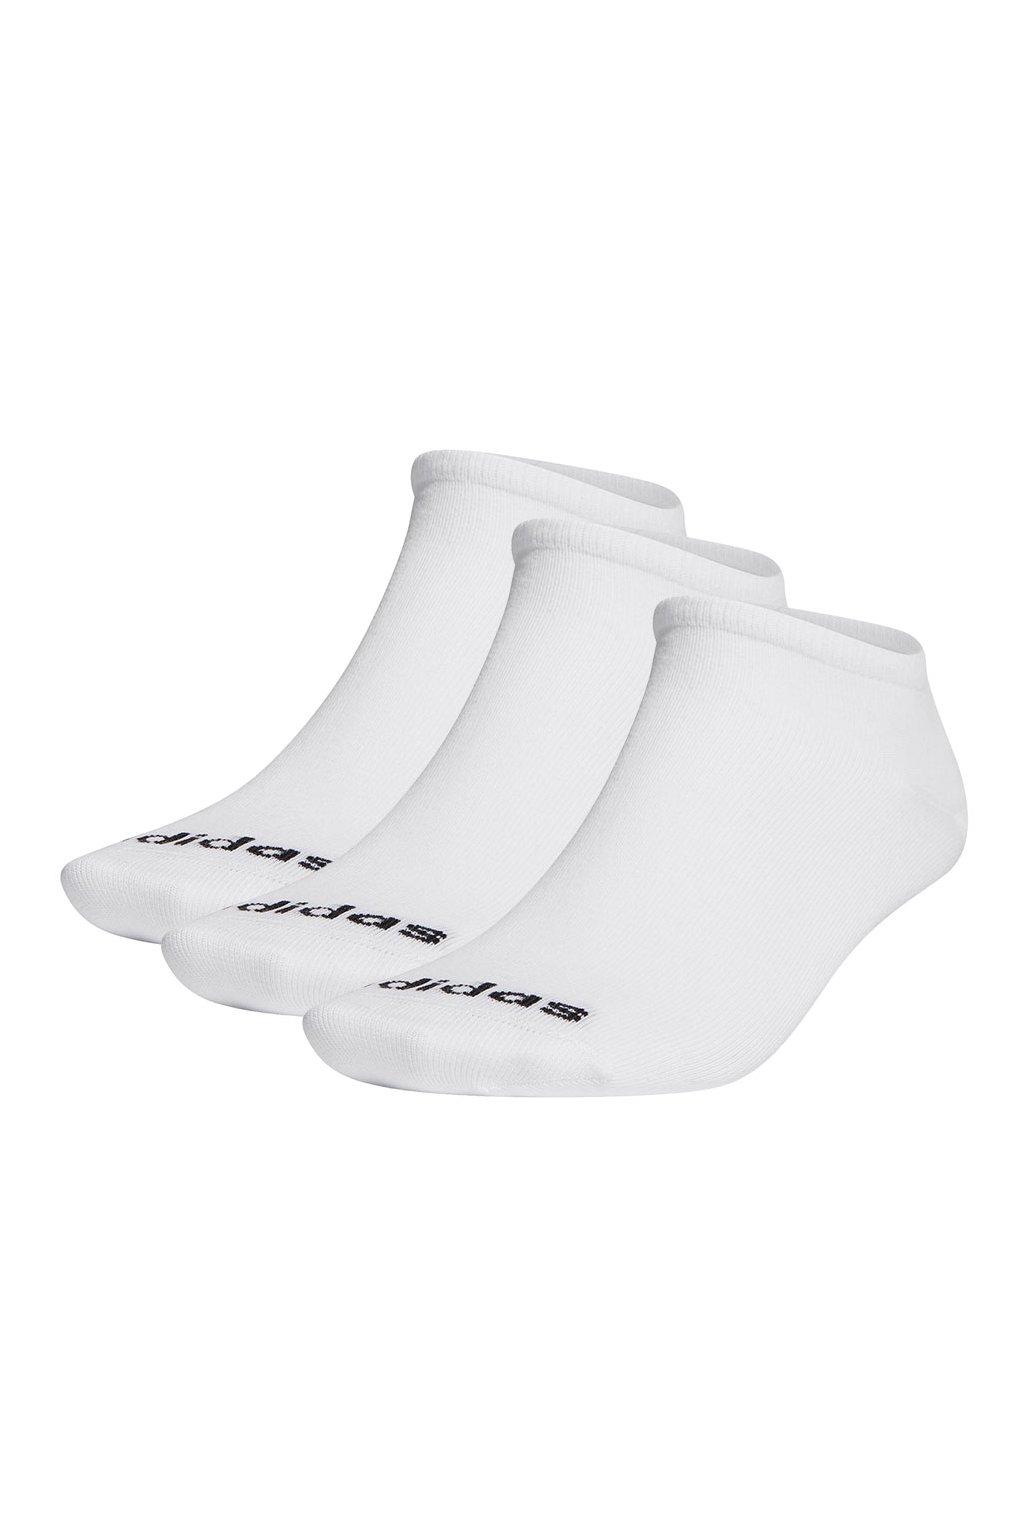 Ponožky adidas Low Cut 3PP biele GE1382